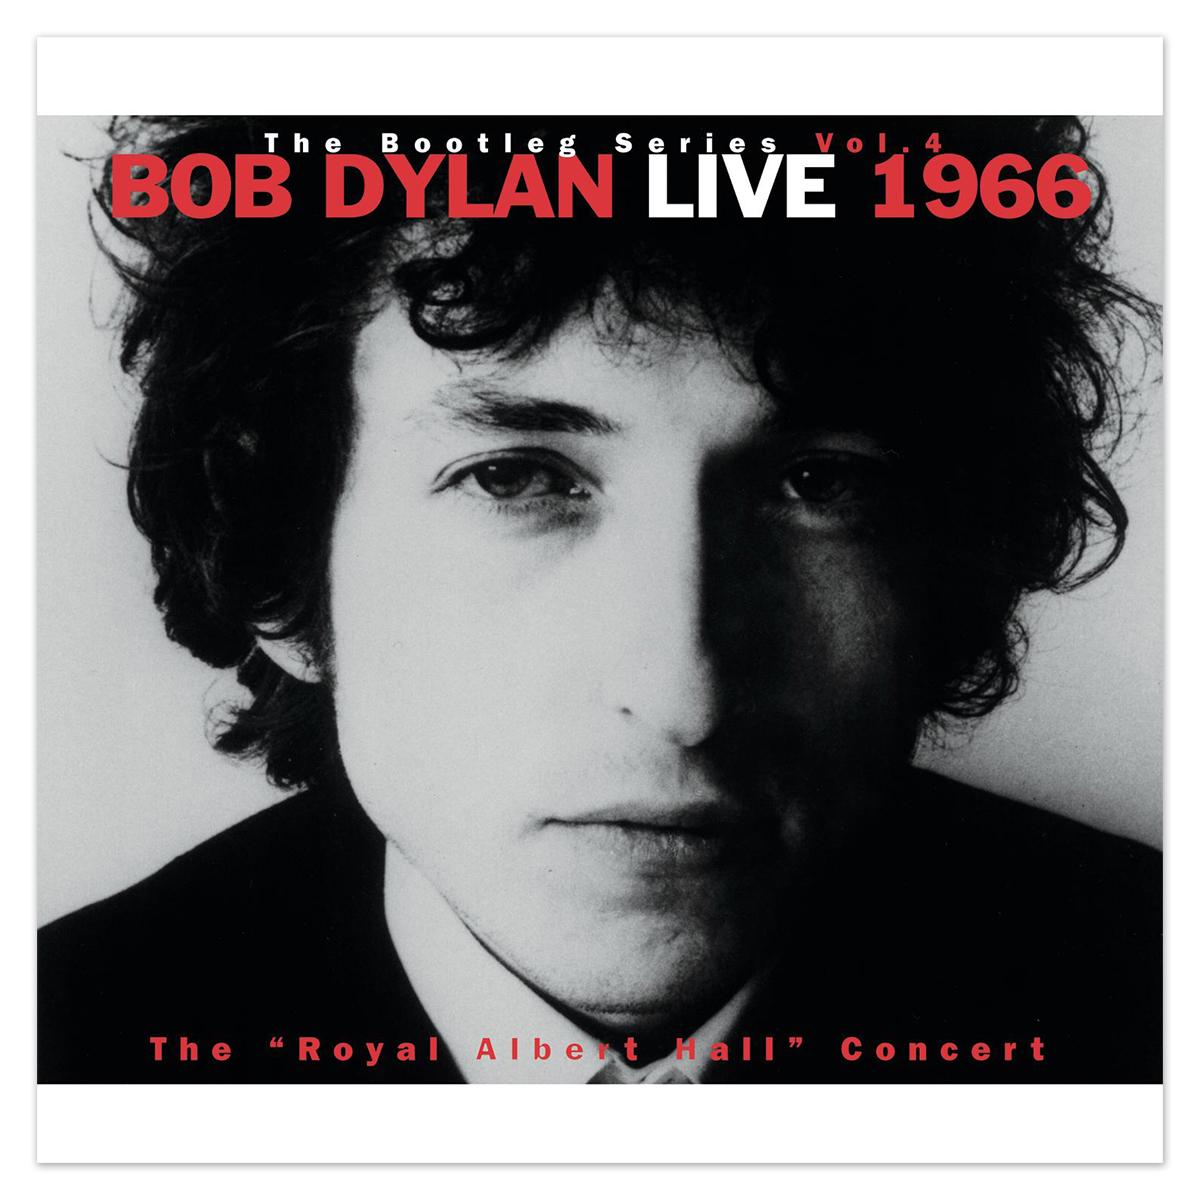 the bootleg series vol 4 bob dylan live 1966 cd shop the bob dylan official store. Black Bedroom Furniture Sets. Home Design Ideas